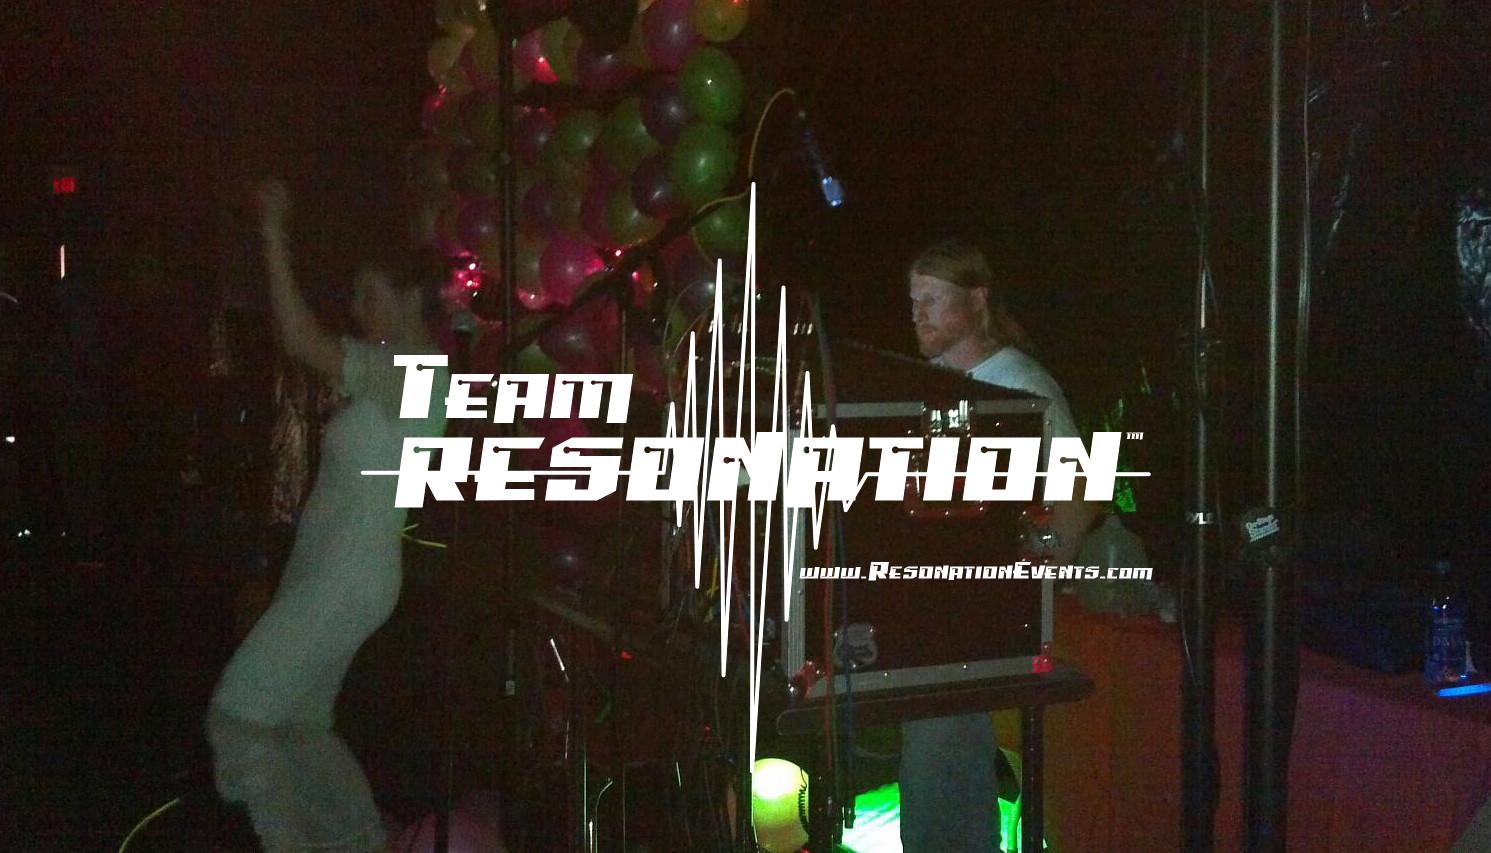 Team Resonation at Work